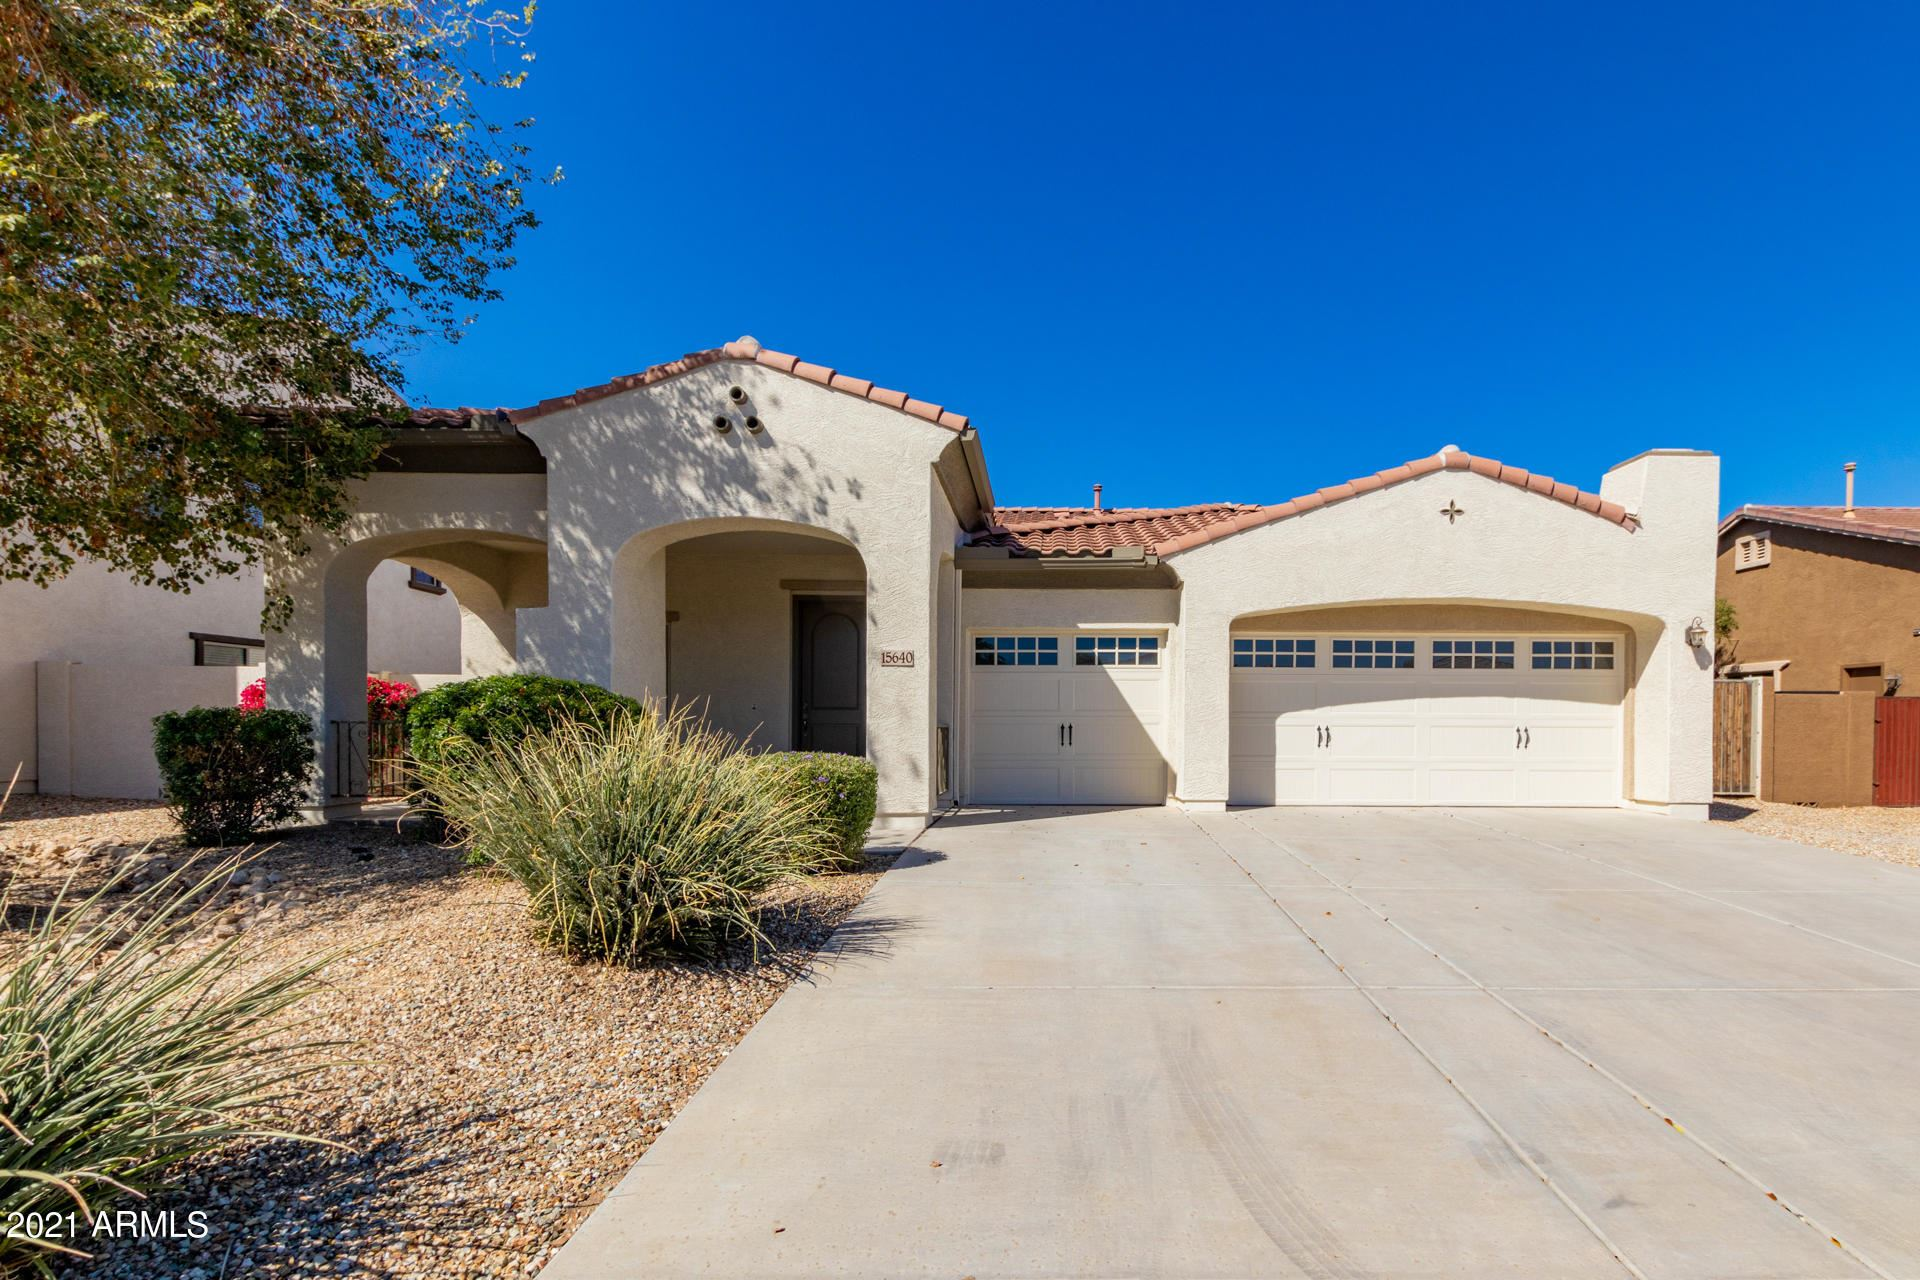 Photo of 15640 W MINNEZONA Avenue, Goodyear, AZ 85395 (MLS # 6199693)